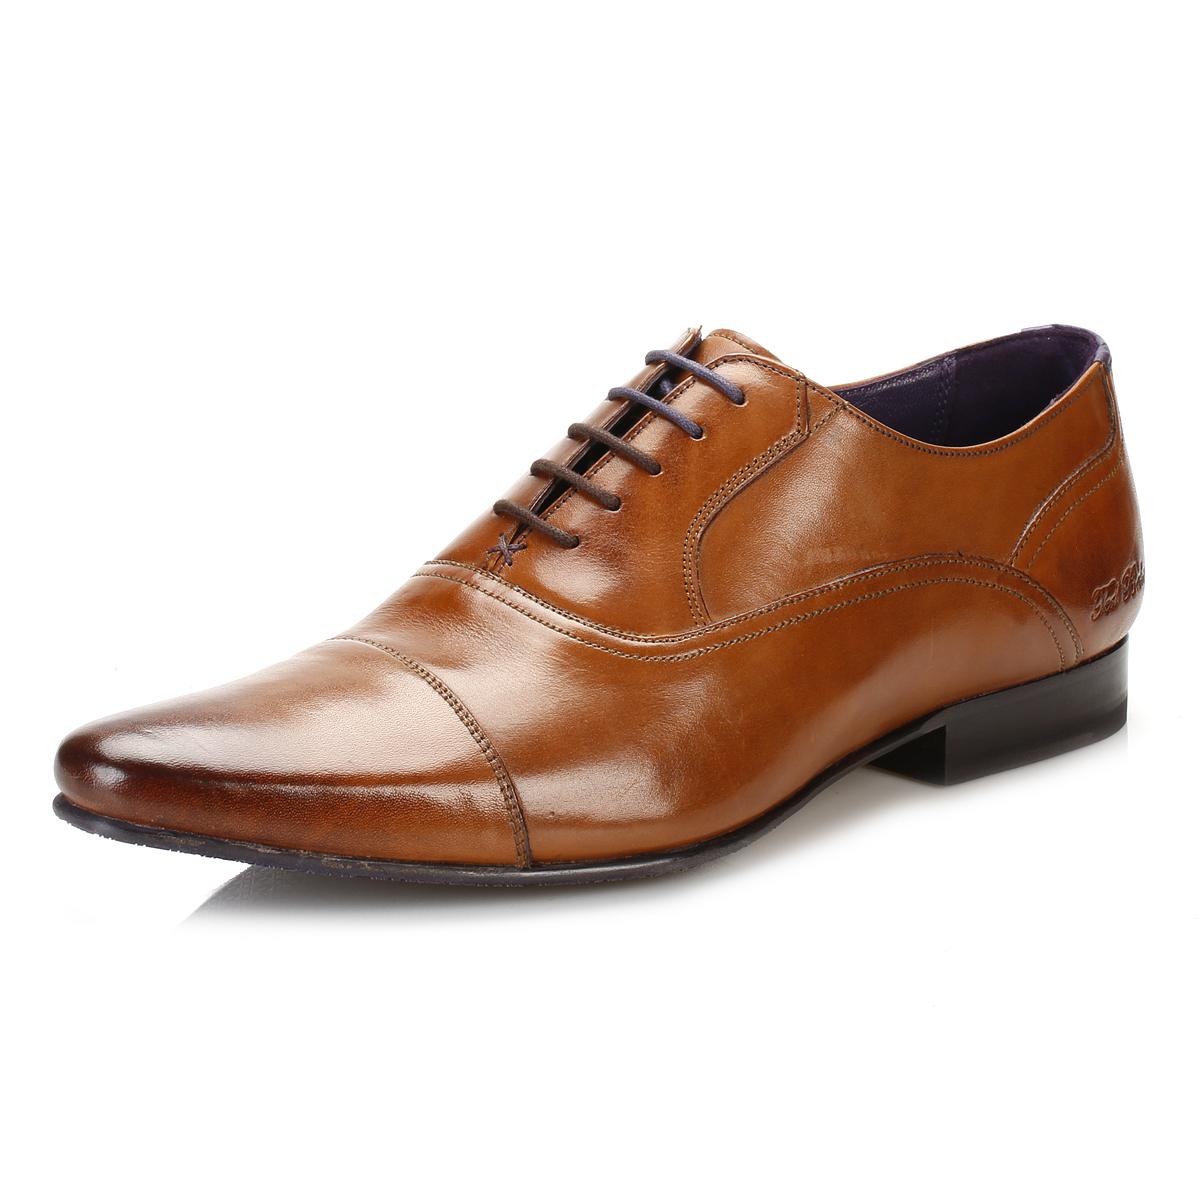 Ted Baker Dark Brown Shoes